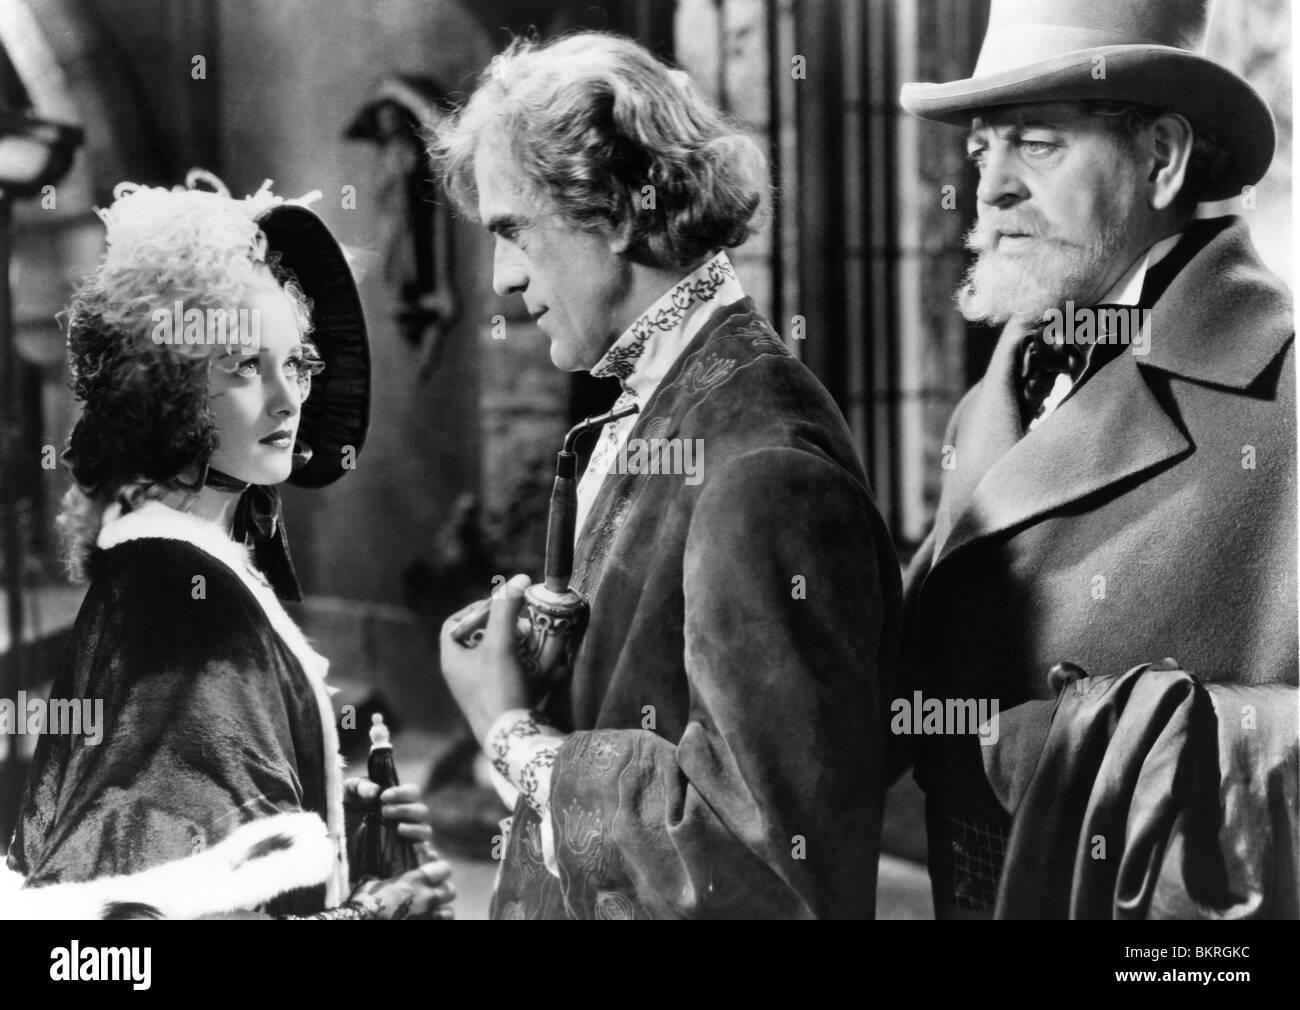 THE BLACK ROOM (1935) BORIS KARLOFF, MARIAN MARSH, THURSTON HALL ROY WILLIAM NEILL (DIR) 002 Stock Photo